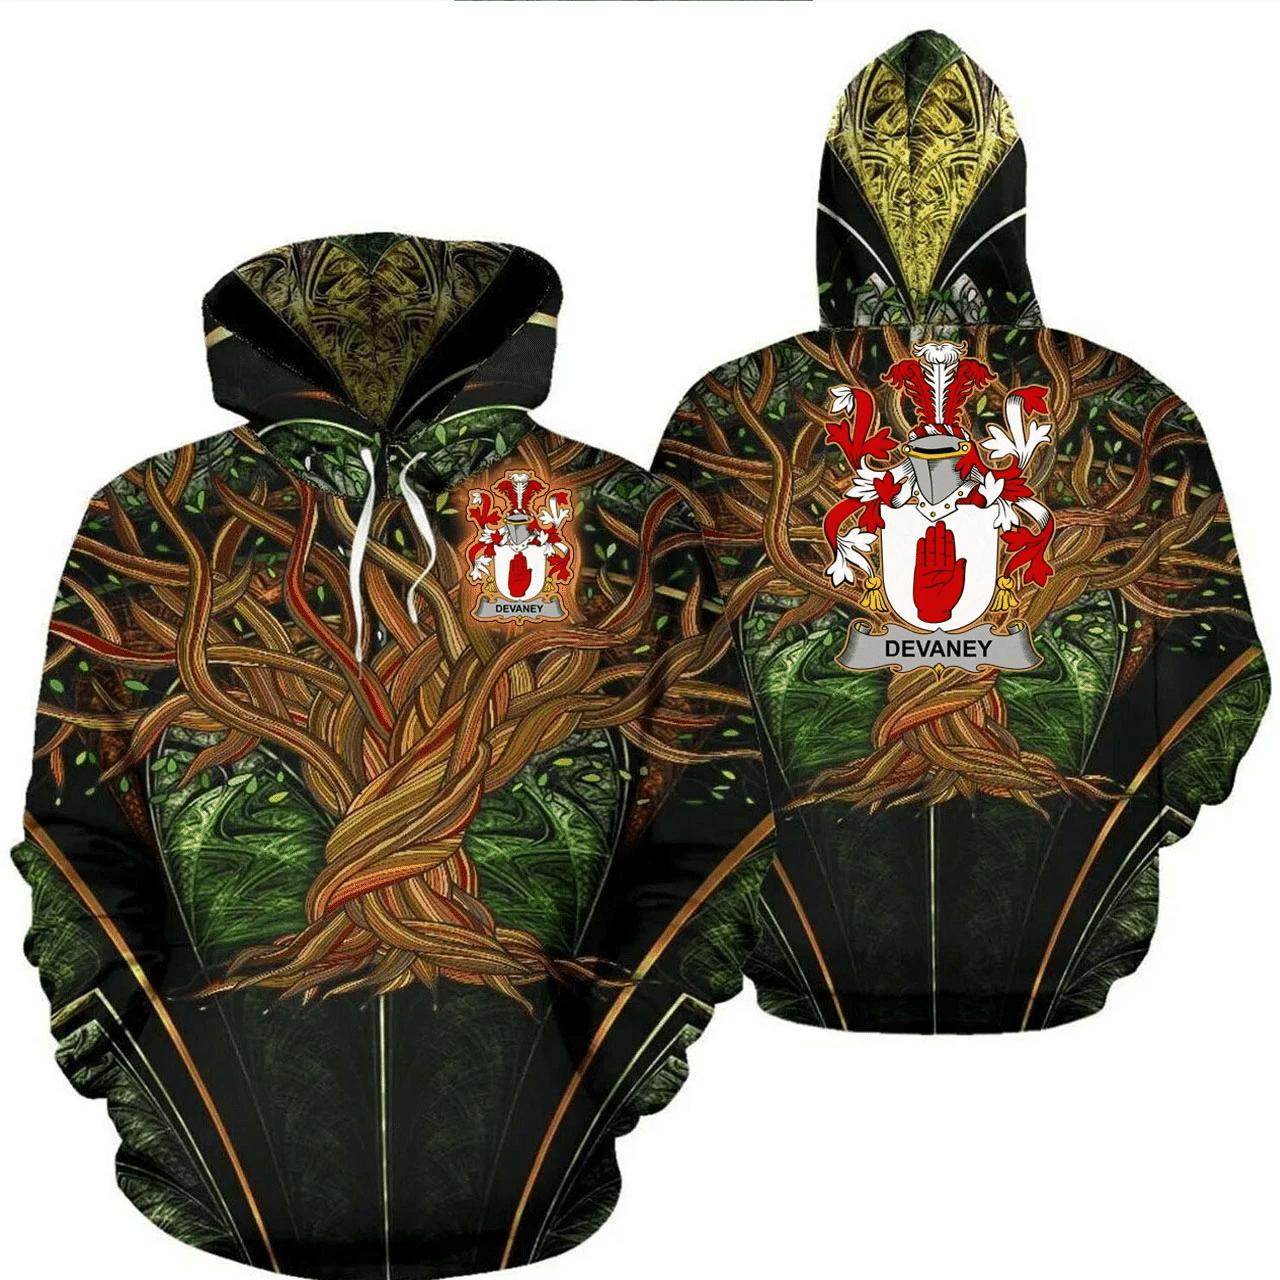 1stIreland Ireland Hoodie - Devaney or O'Devaney Irish Family Crest Hoodie - Tree Of Life A7